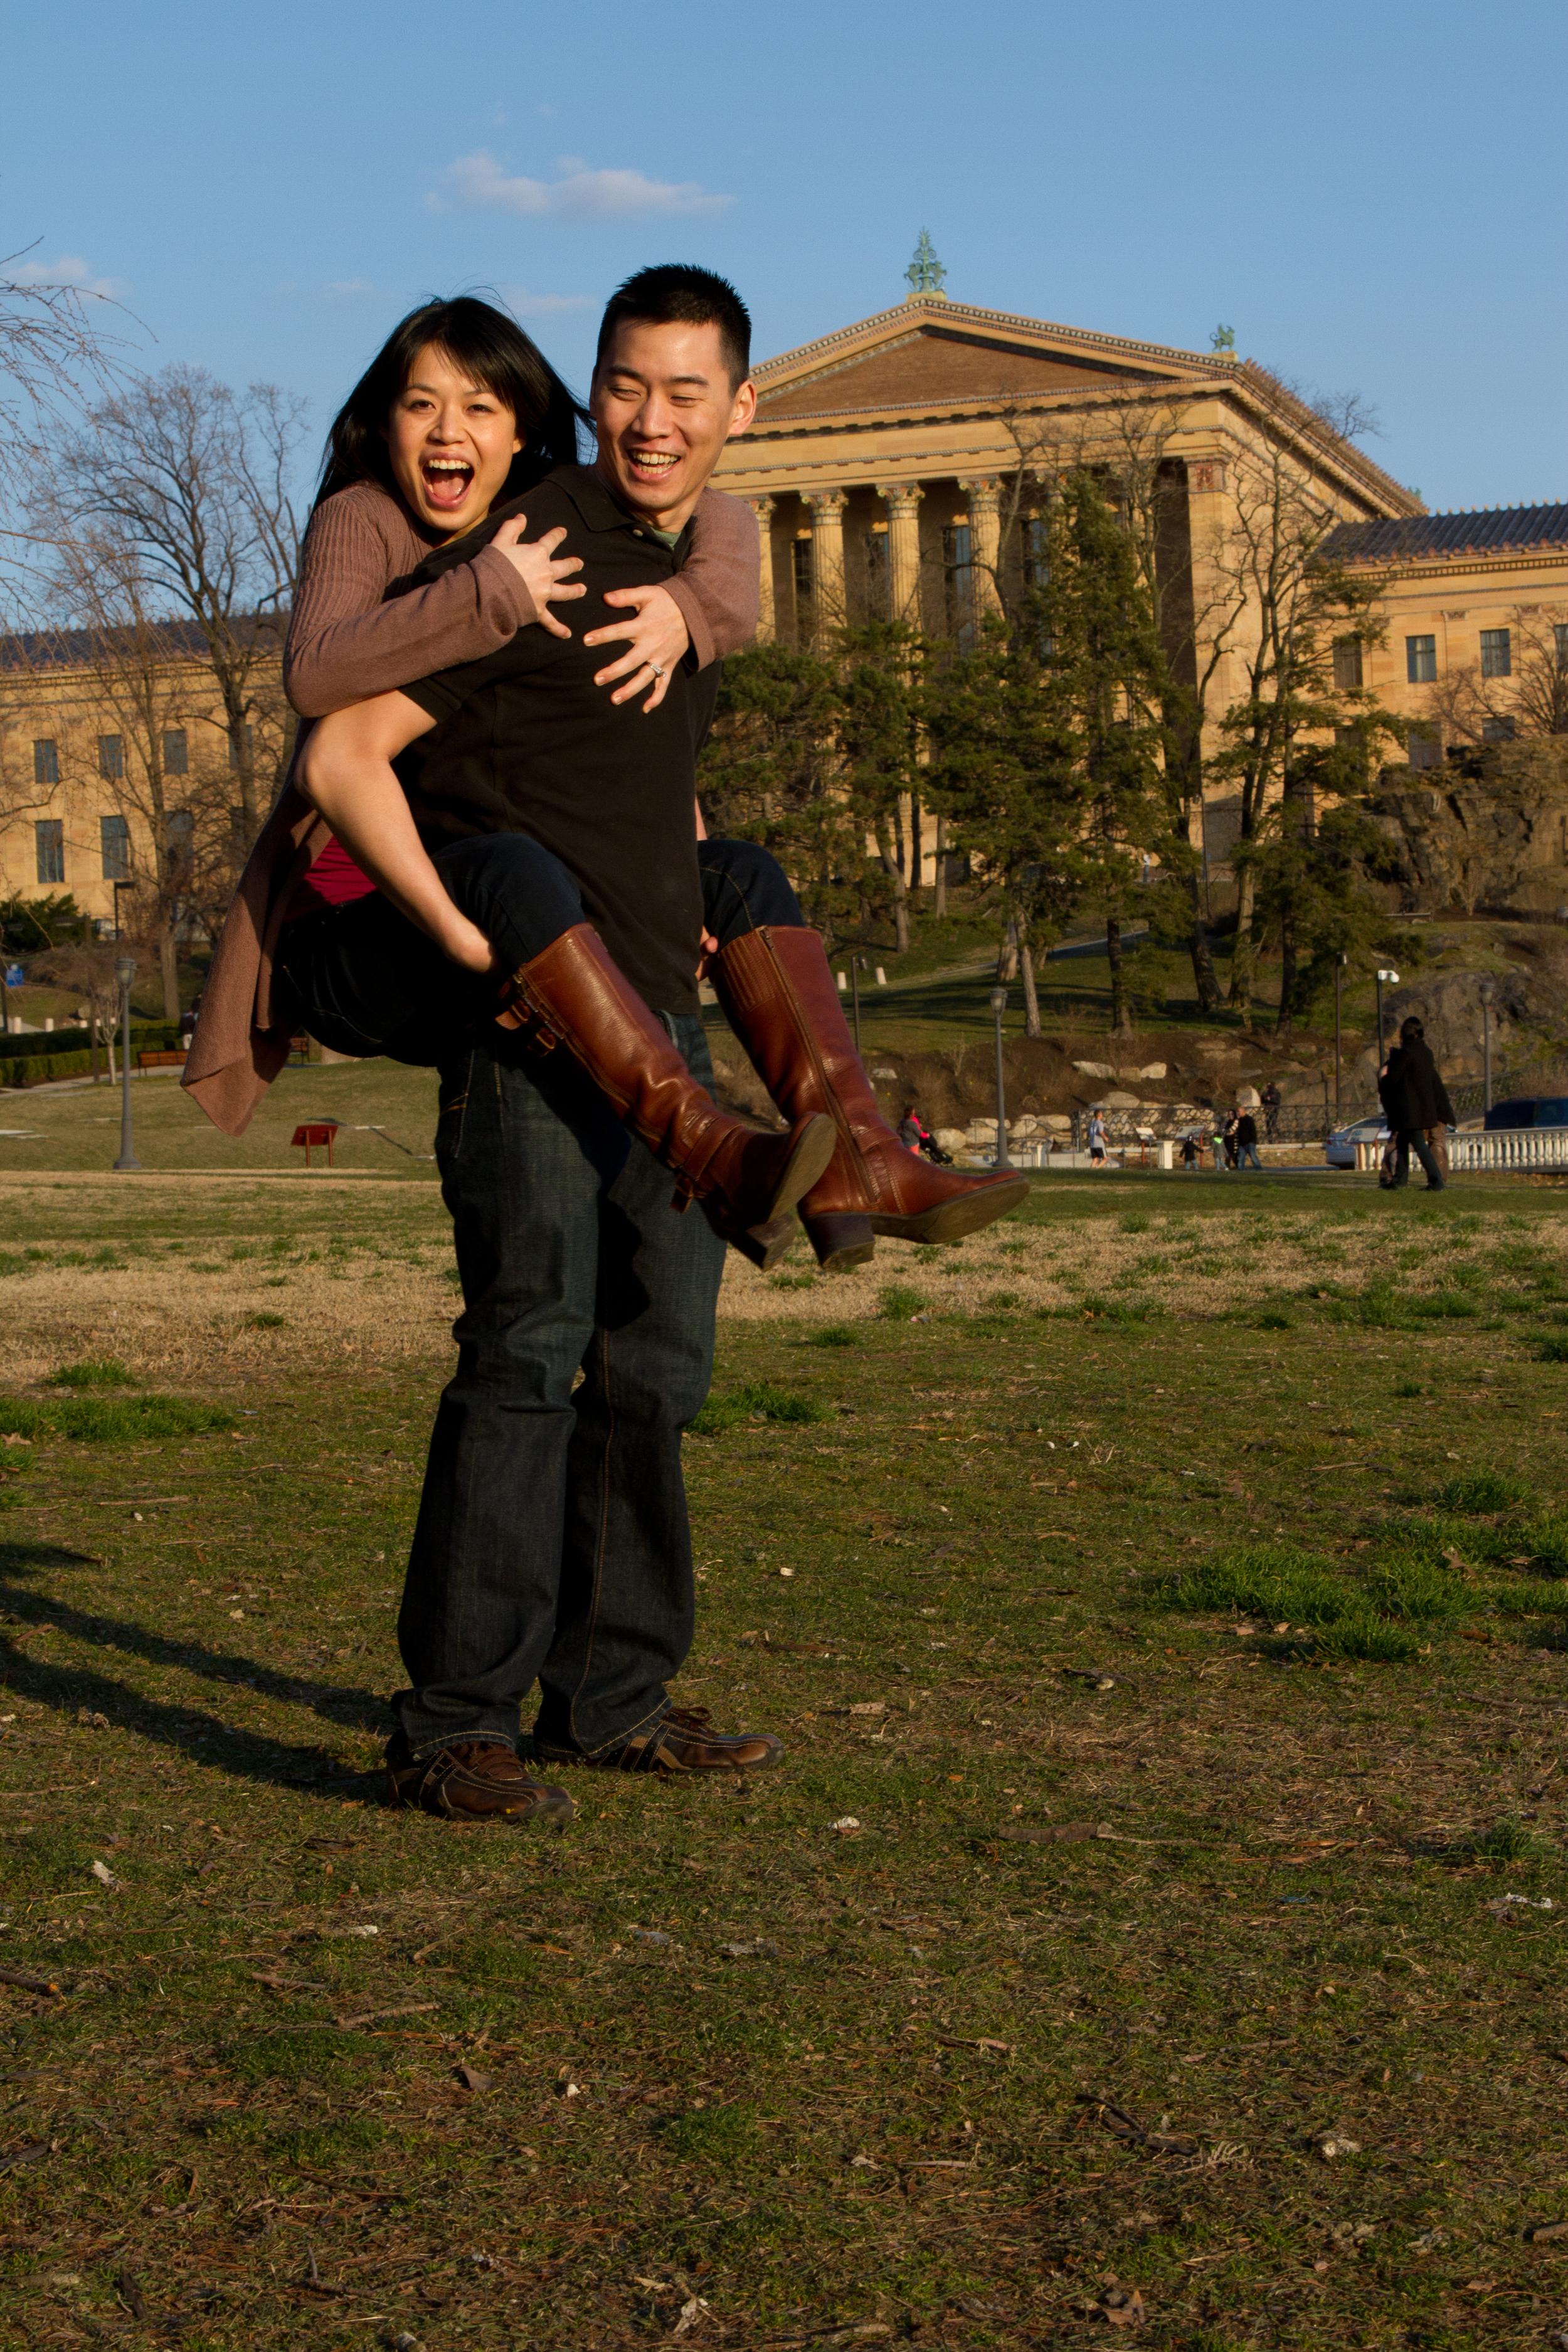 Engagement Photographer Philadelphia Museum of Art Jump on Back Piggy Back Happy She Said Yes